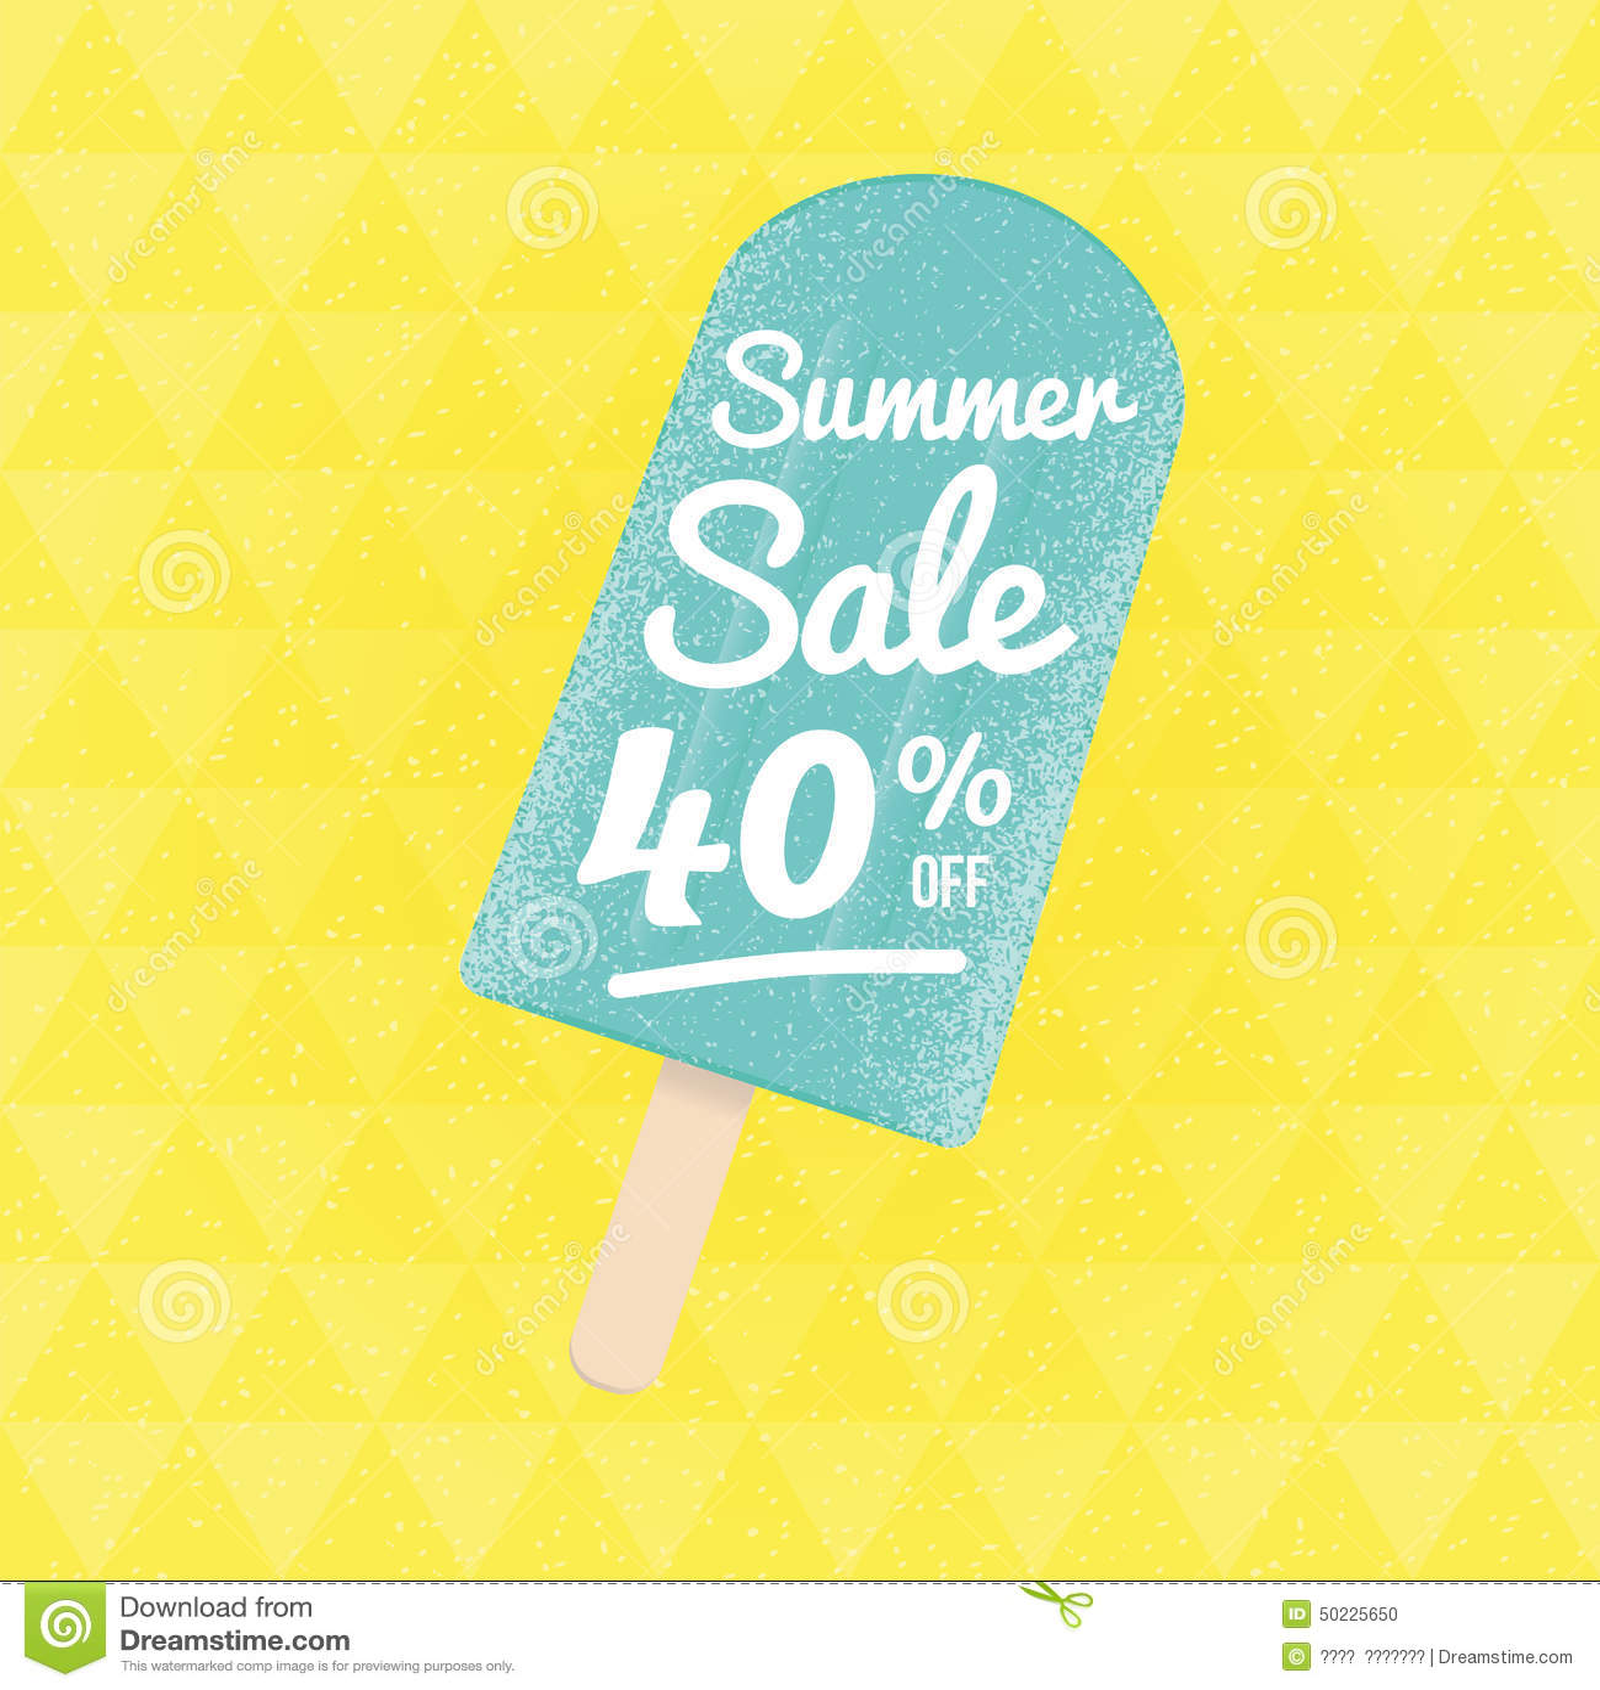 summer sale 40  off  stock vector